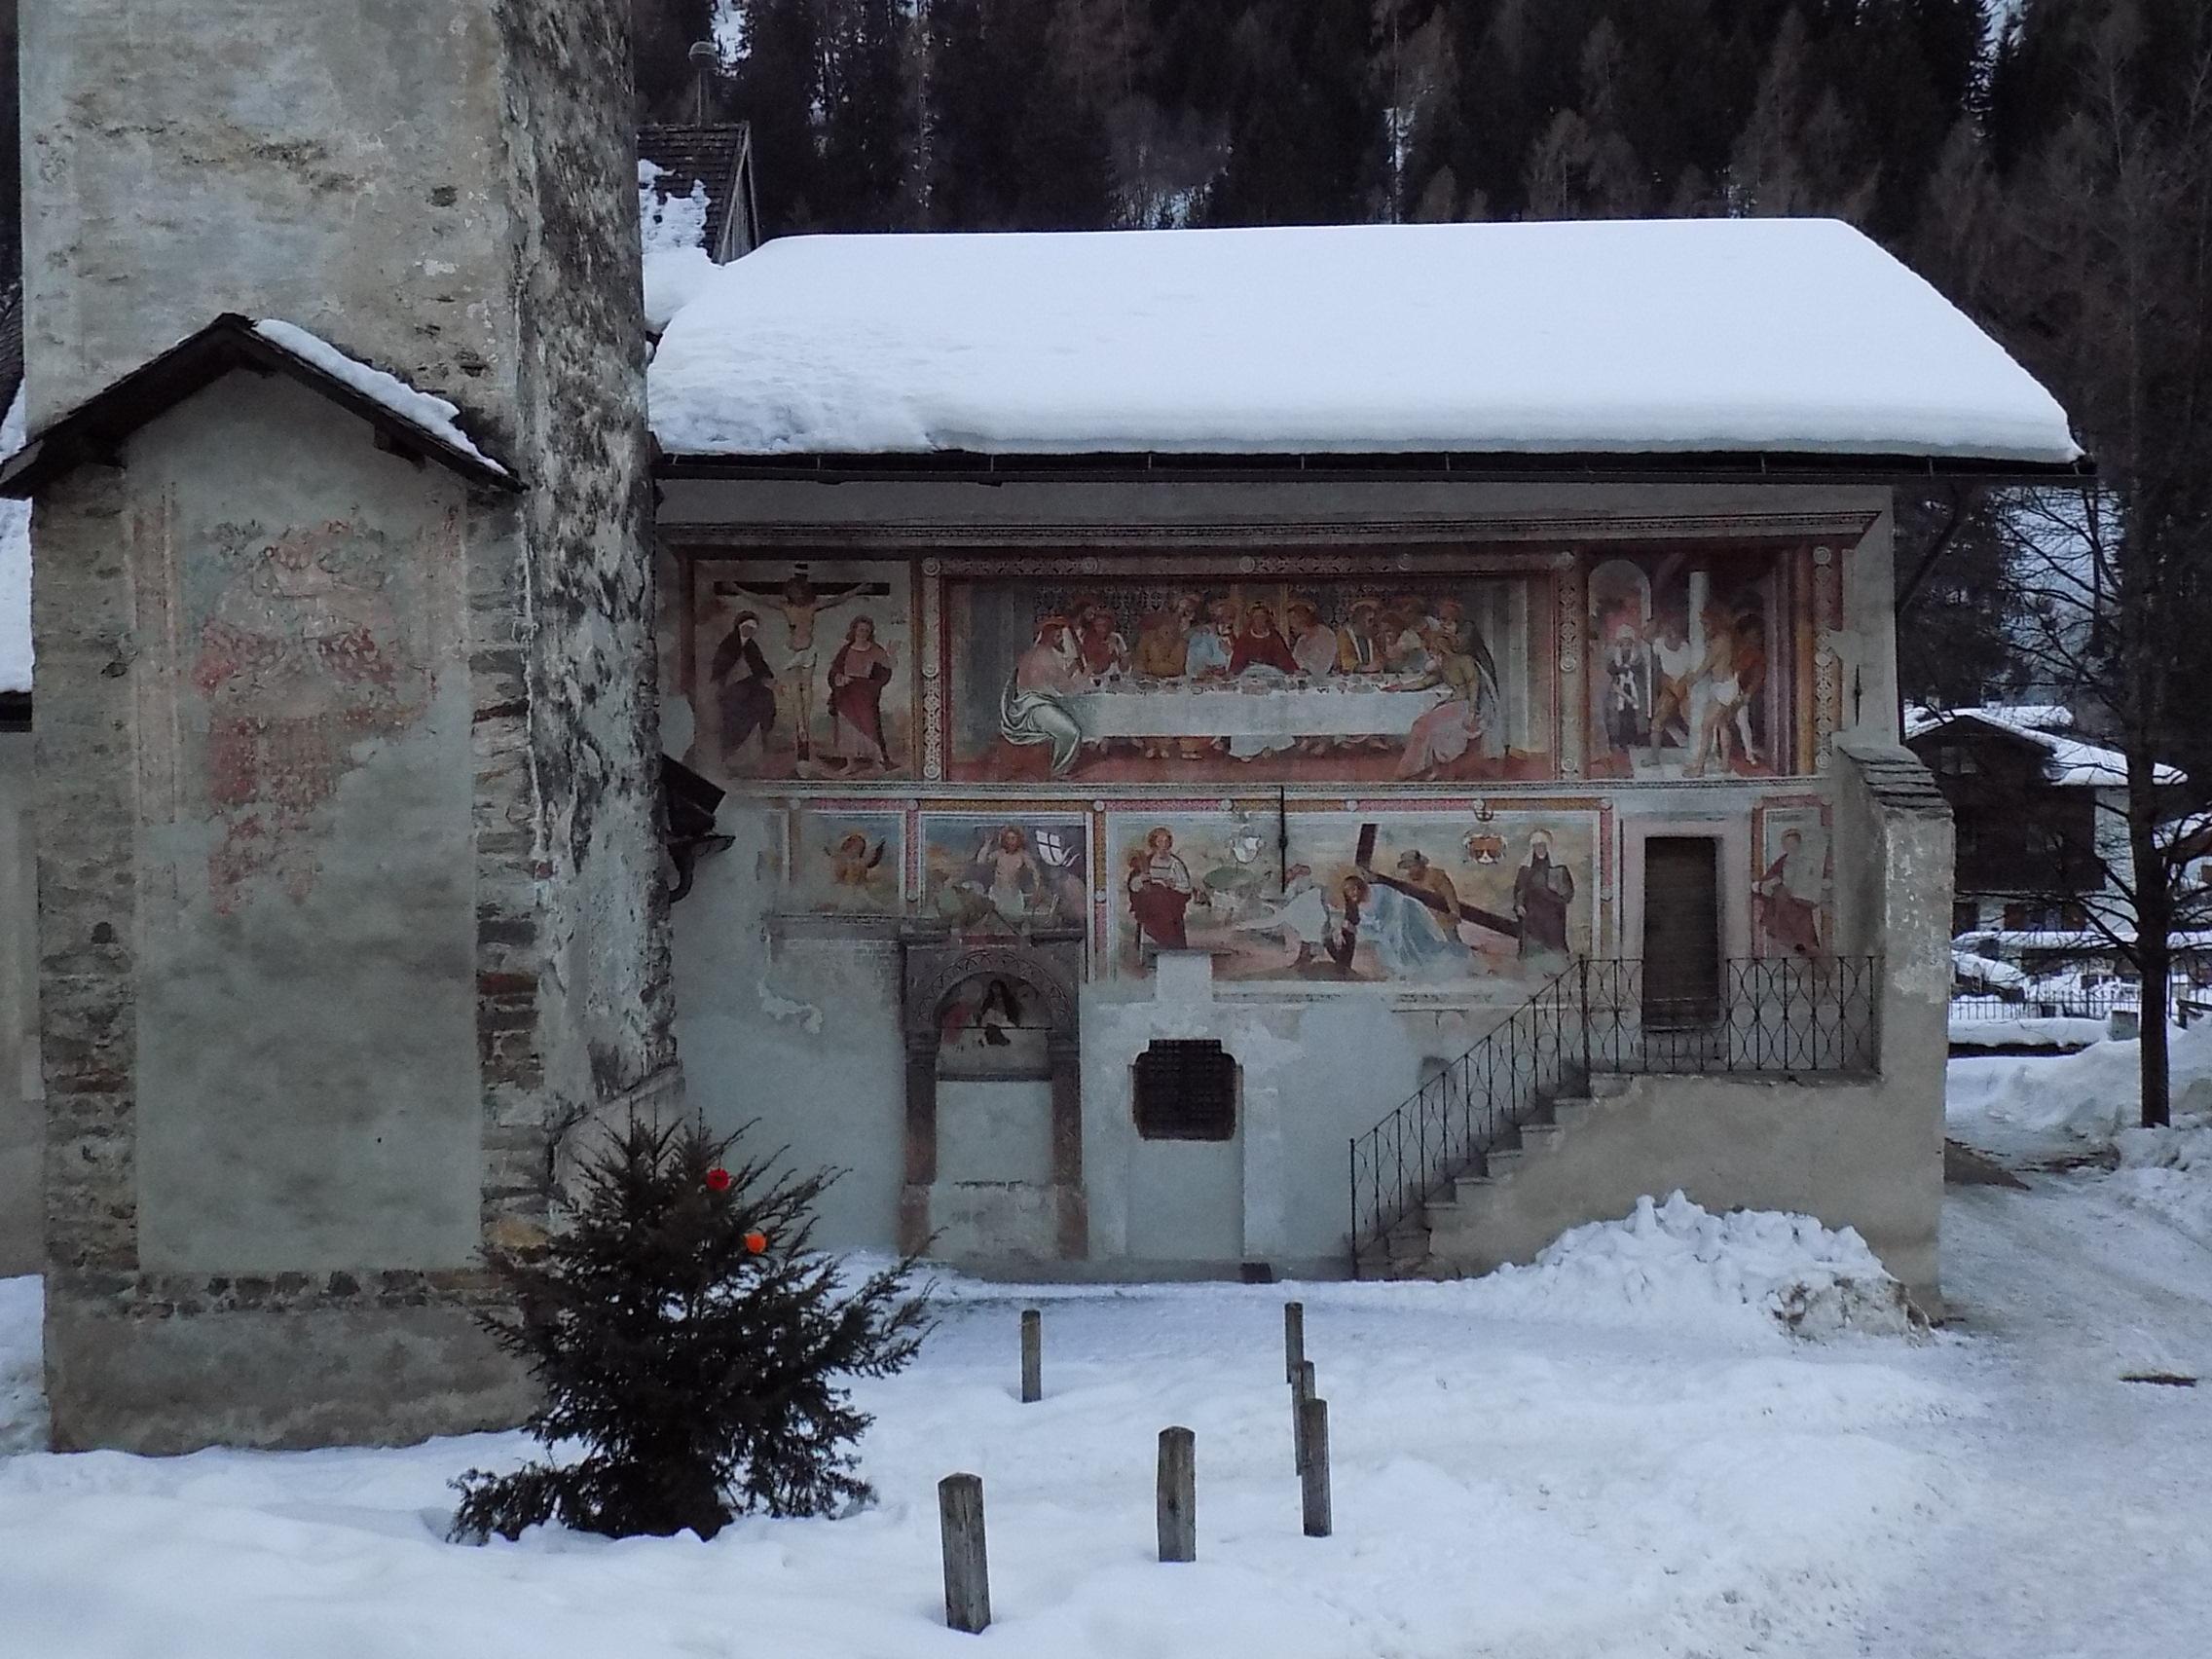 Nowcasting Trentino febbraio 2018-dscn6499.jpg